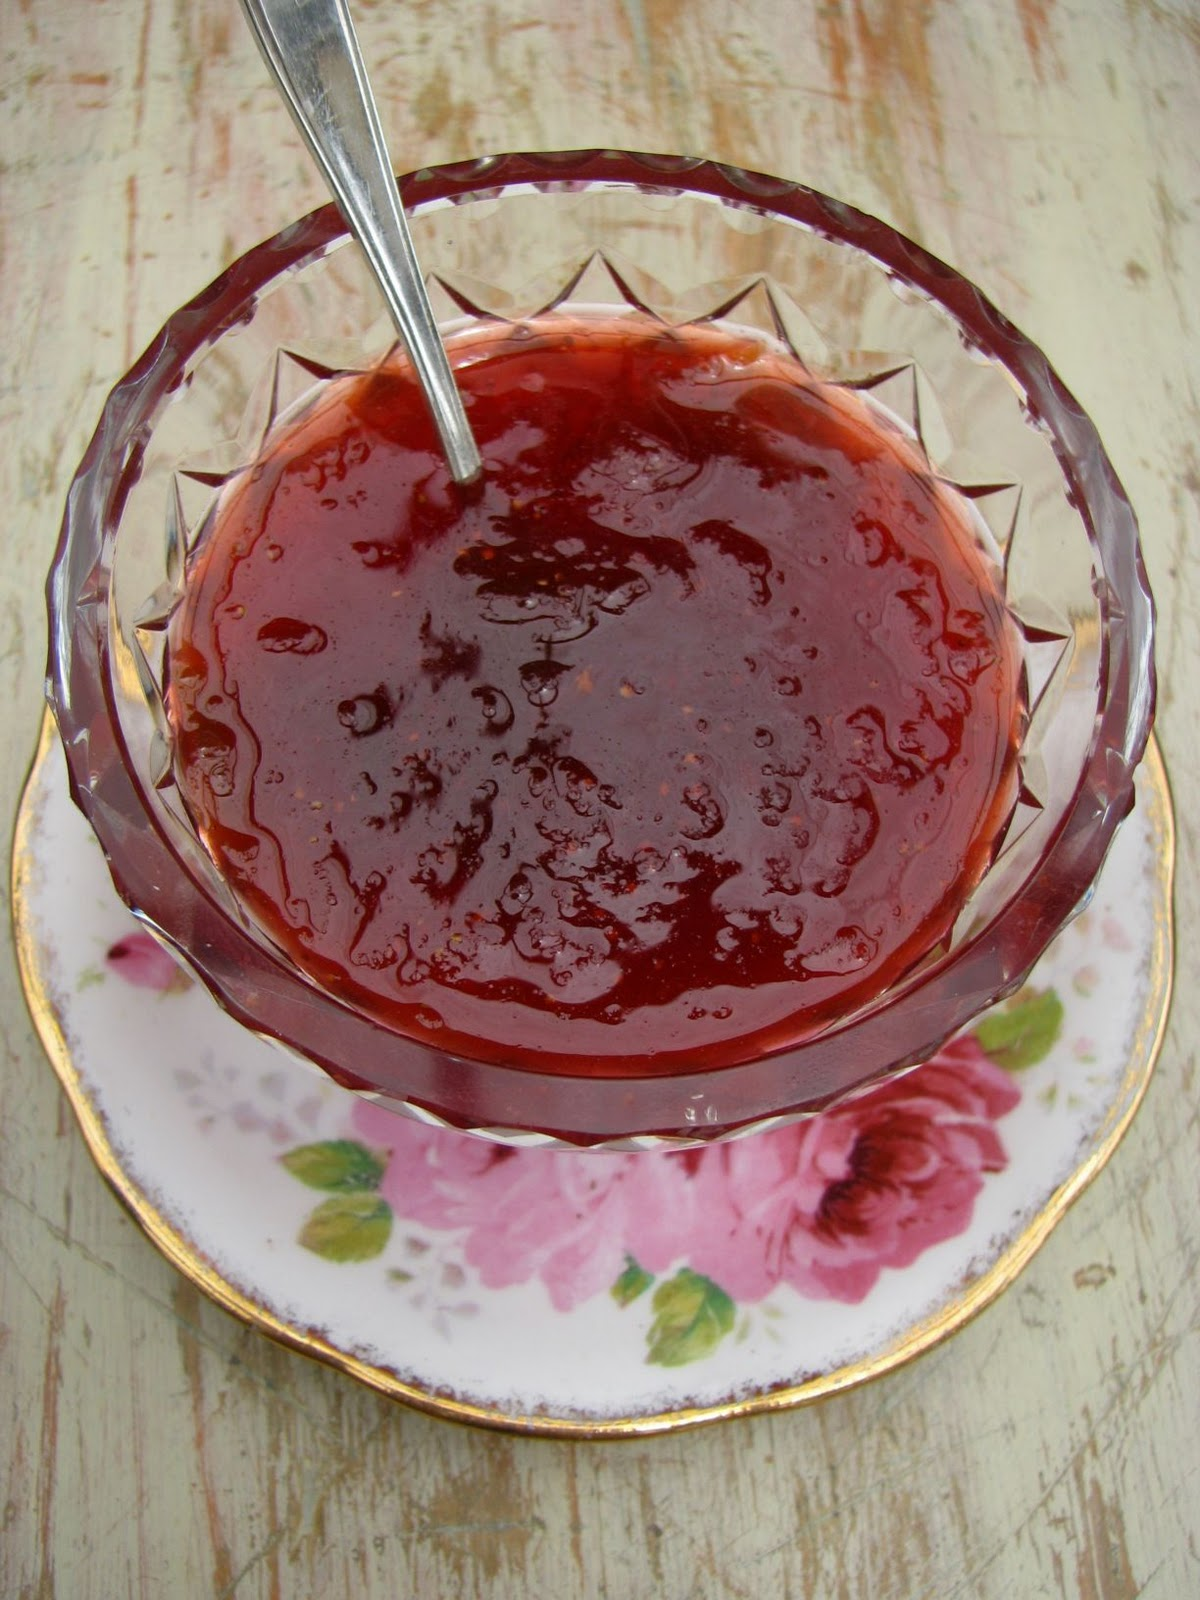 my darling lemon thyme: strawberry + rhubarb jam recipe